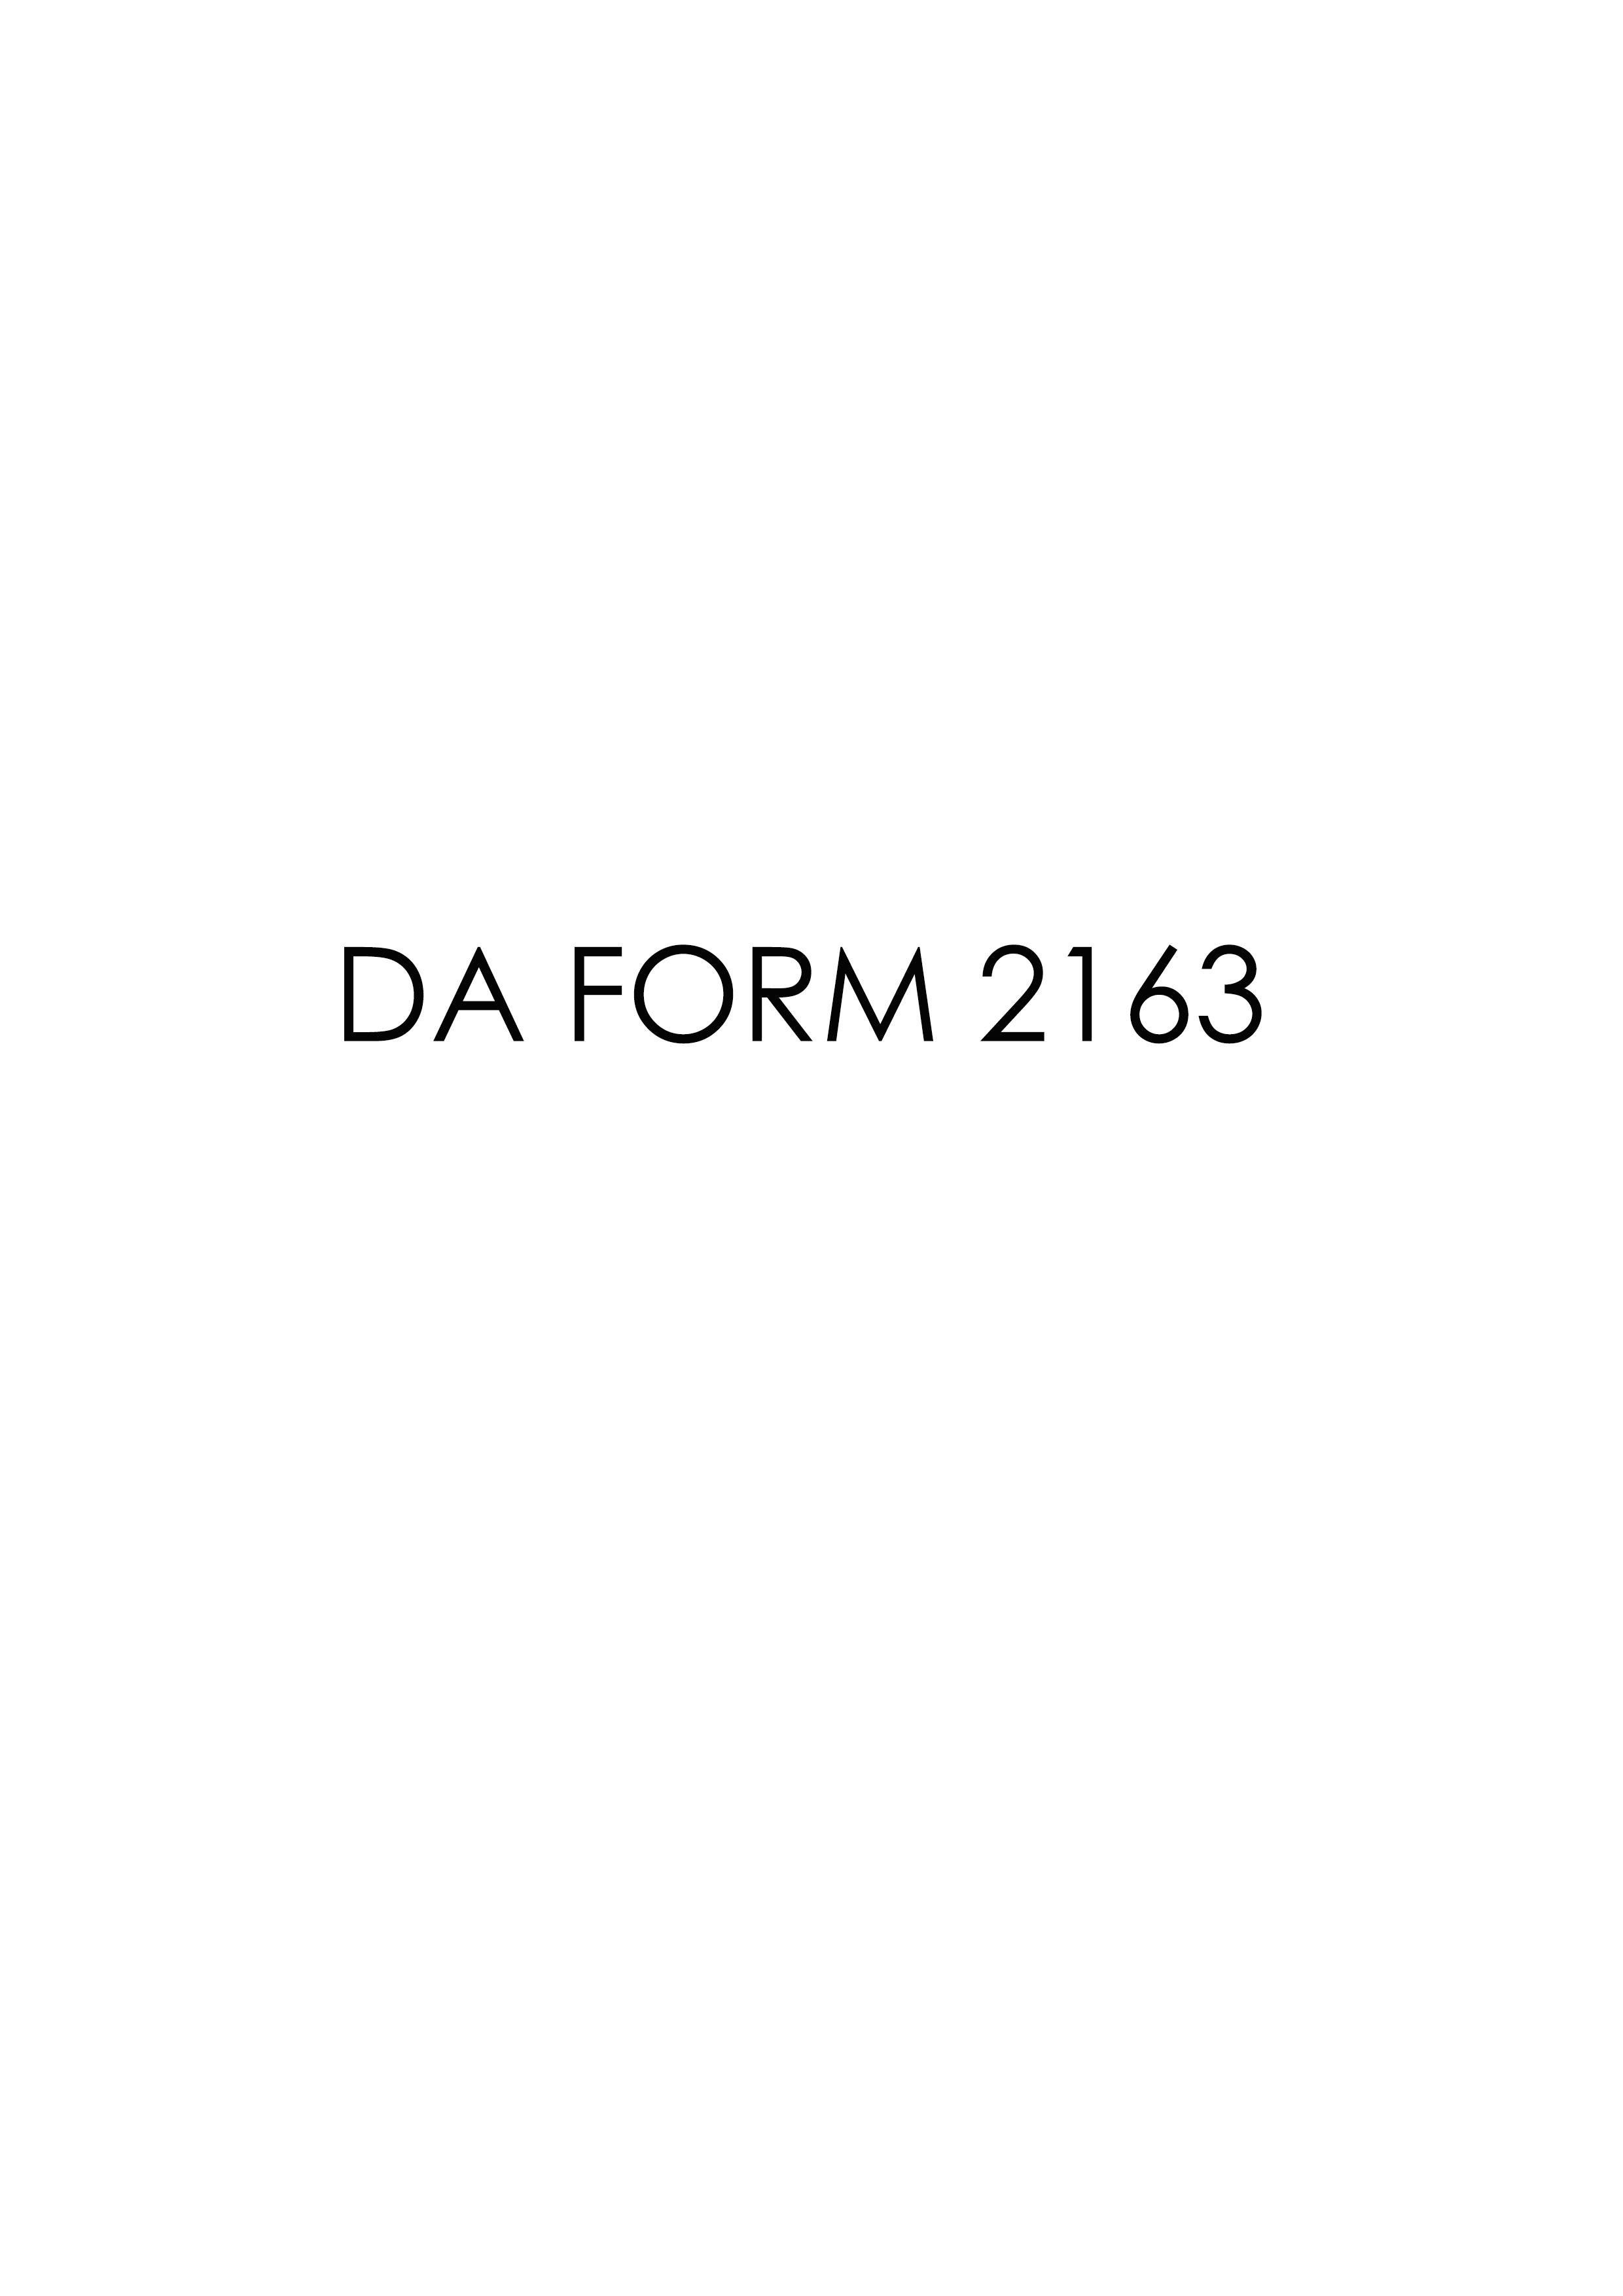 Download da Form 2163 Free